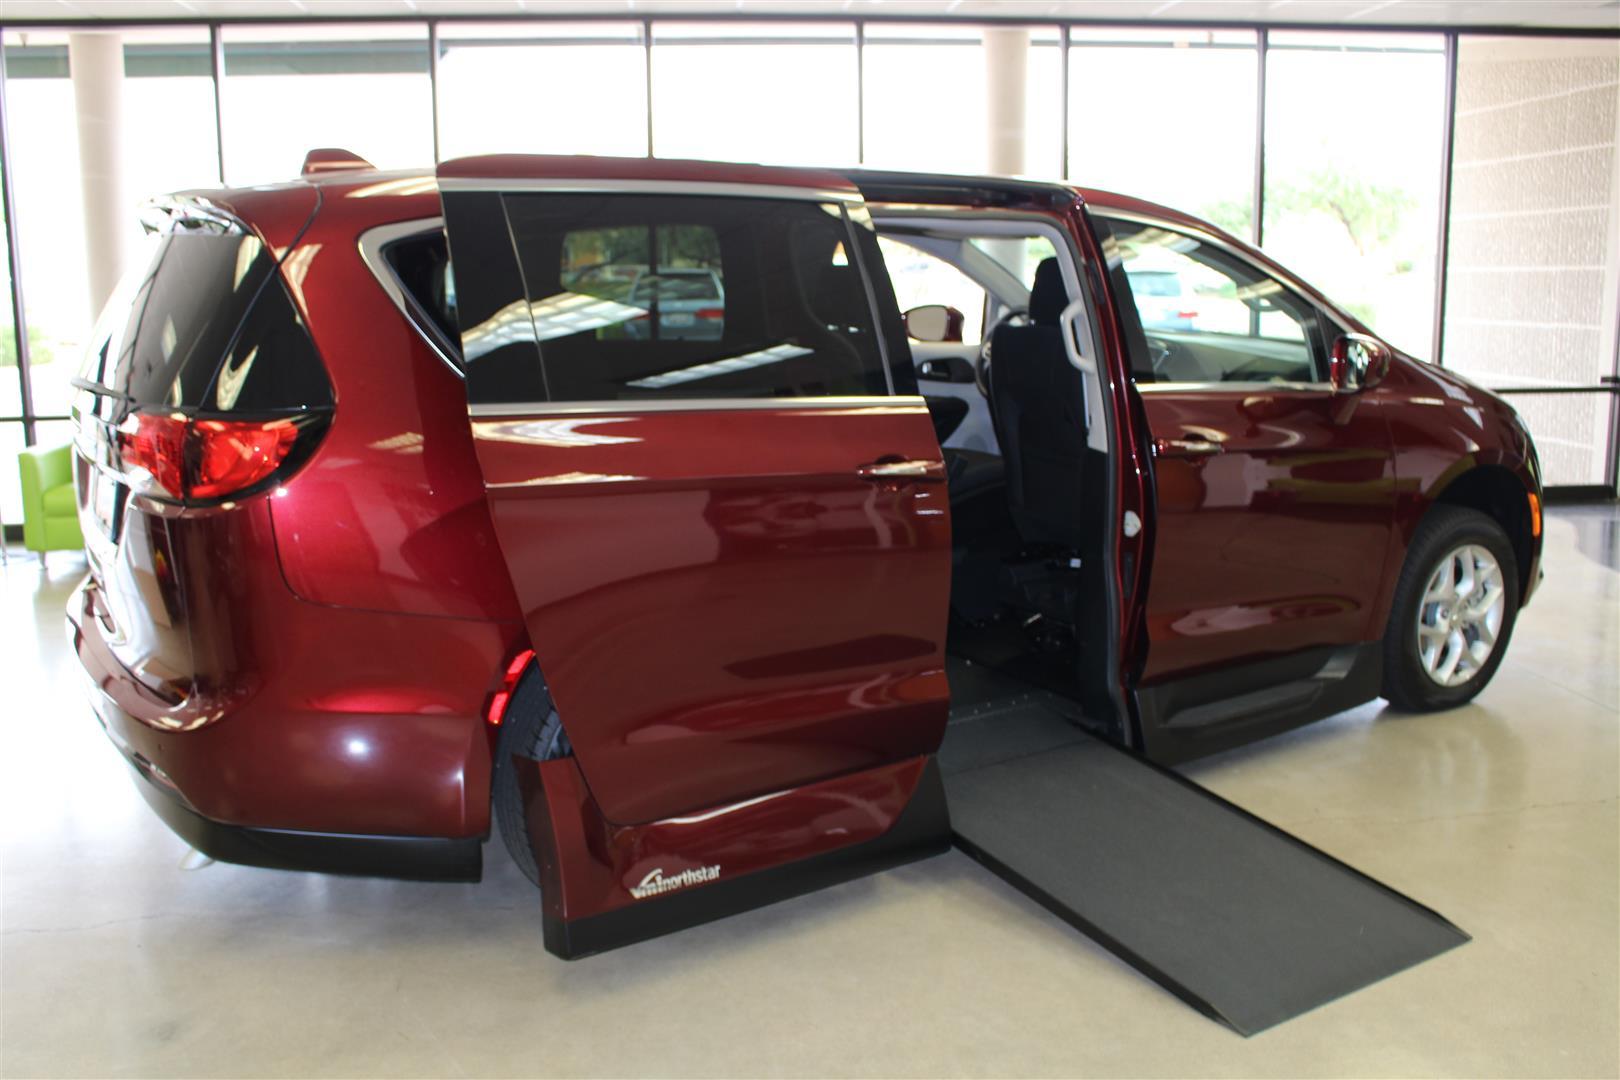 2018 Chrysler Pacifica Side Entry Wheelchair Van - Photo 1 - Phoenix, AZ 85040